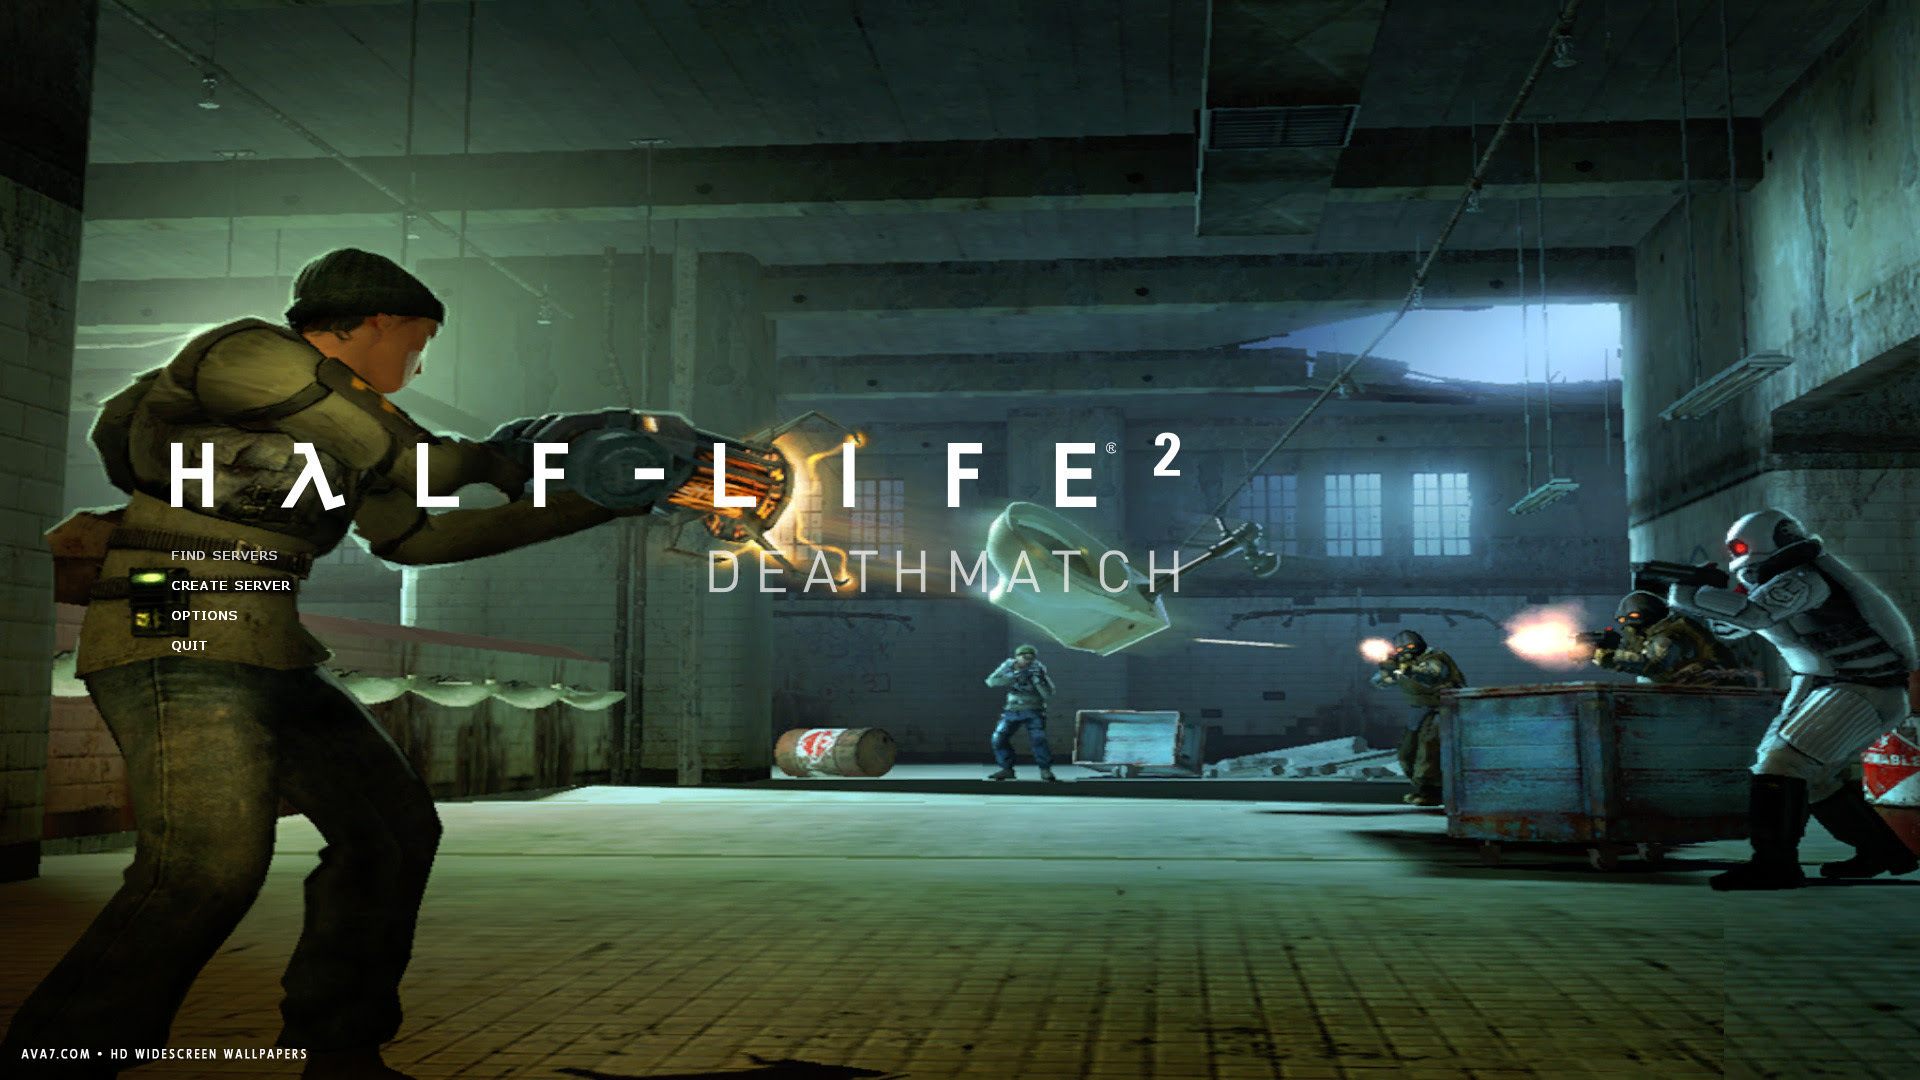 Half Life 2 Deathmatch Game Hd Widescreen Wallpaper Games